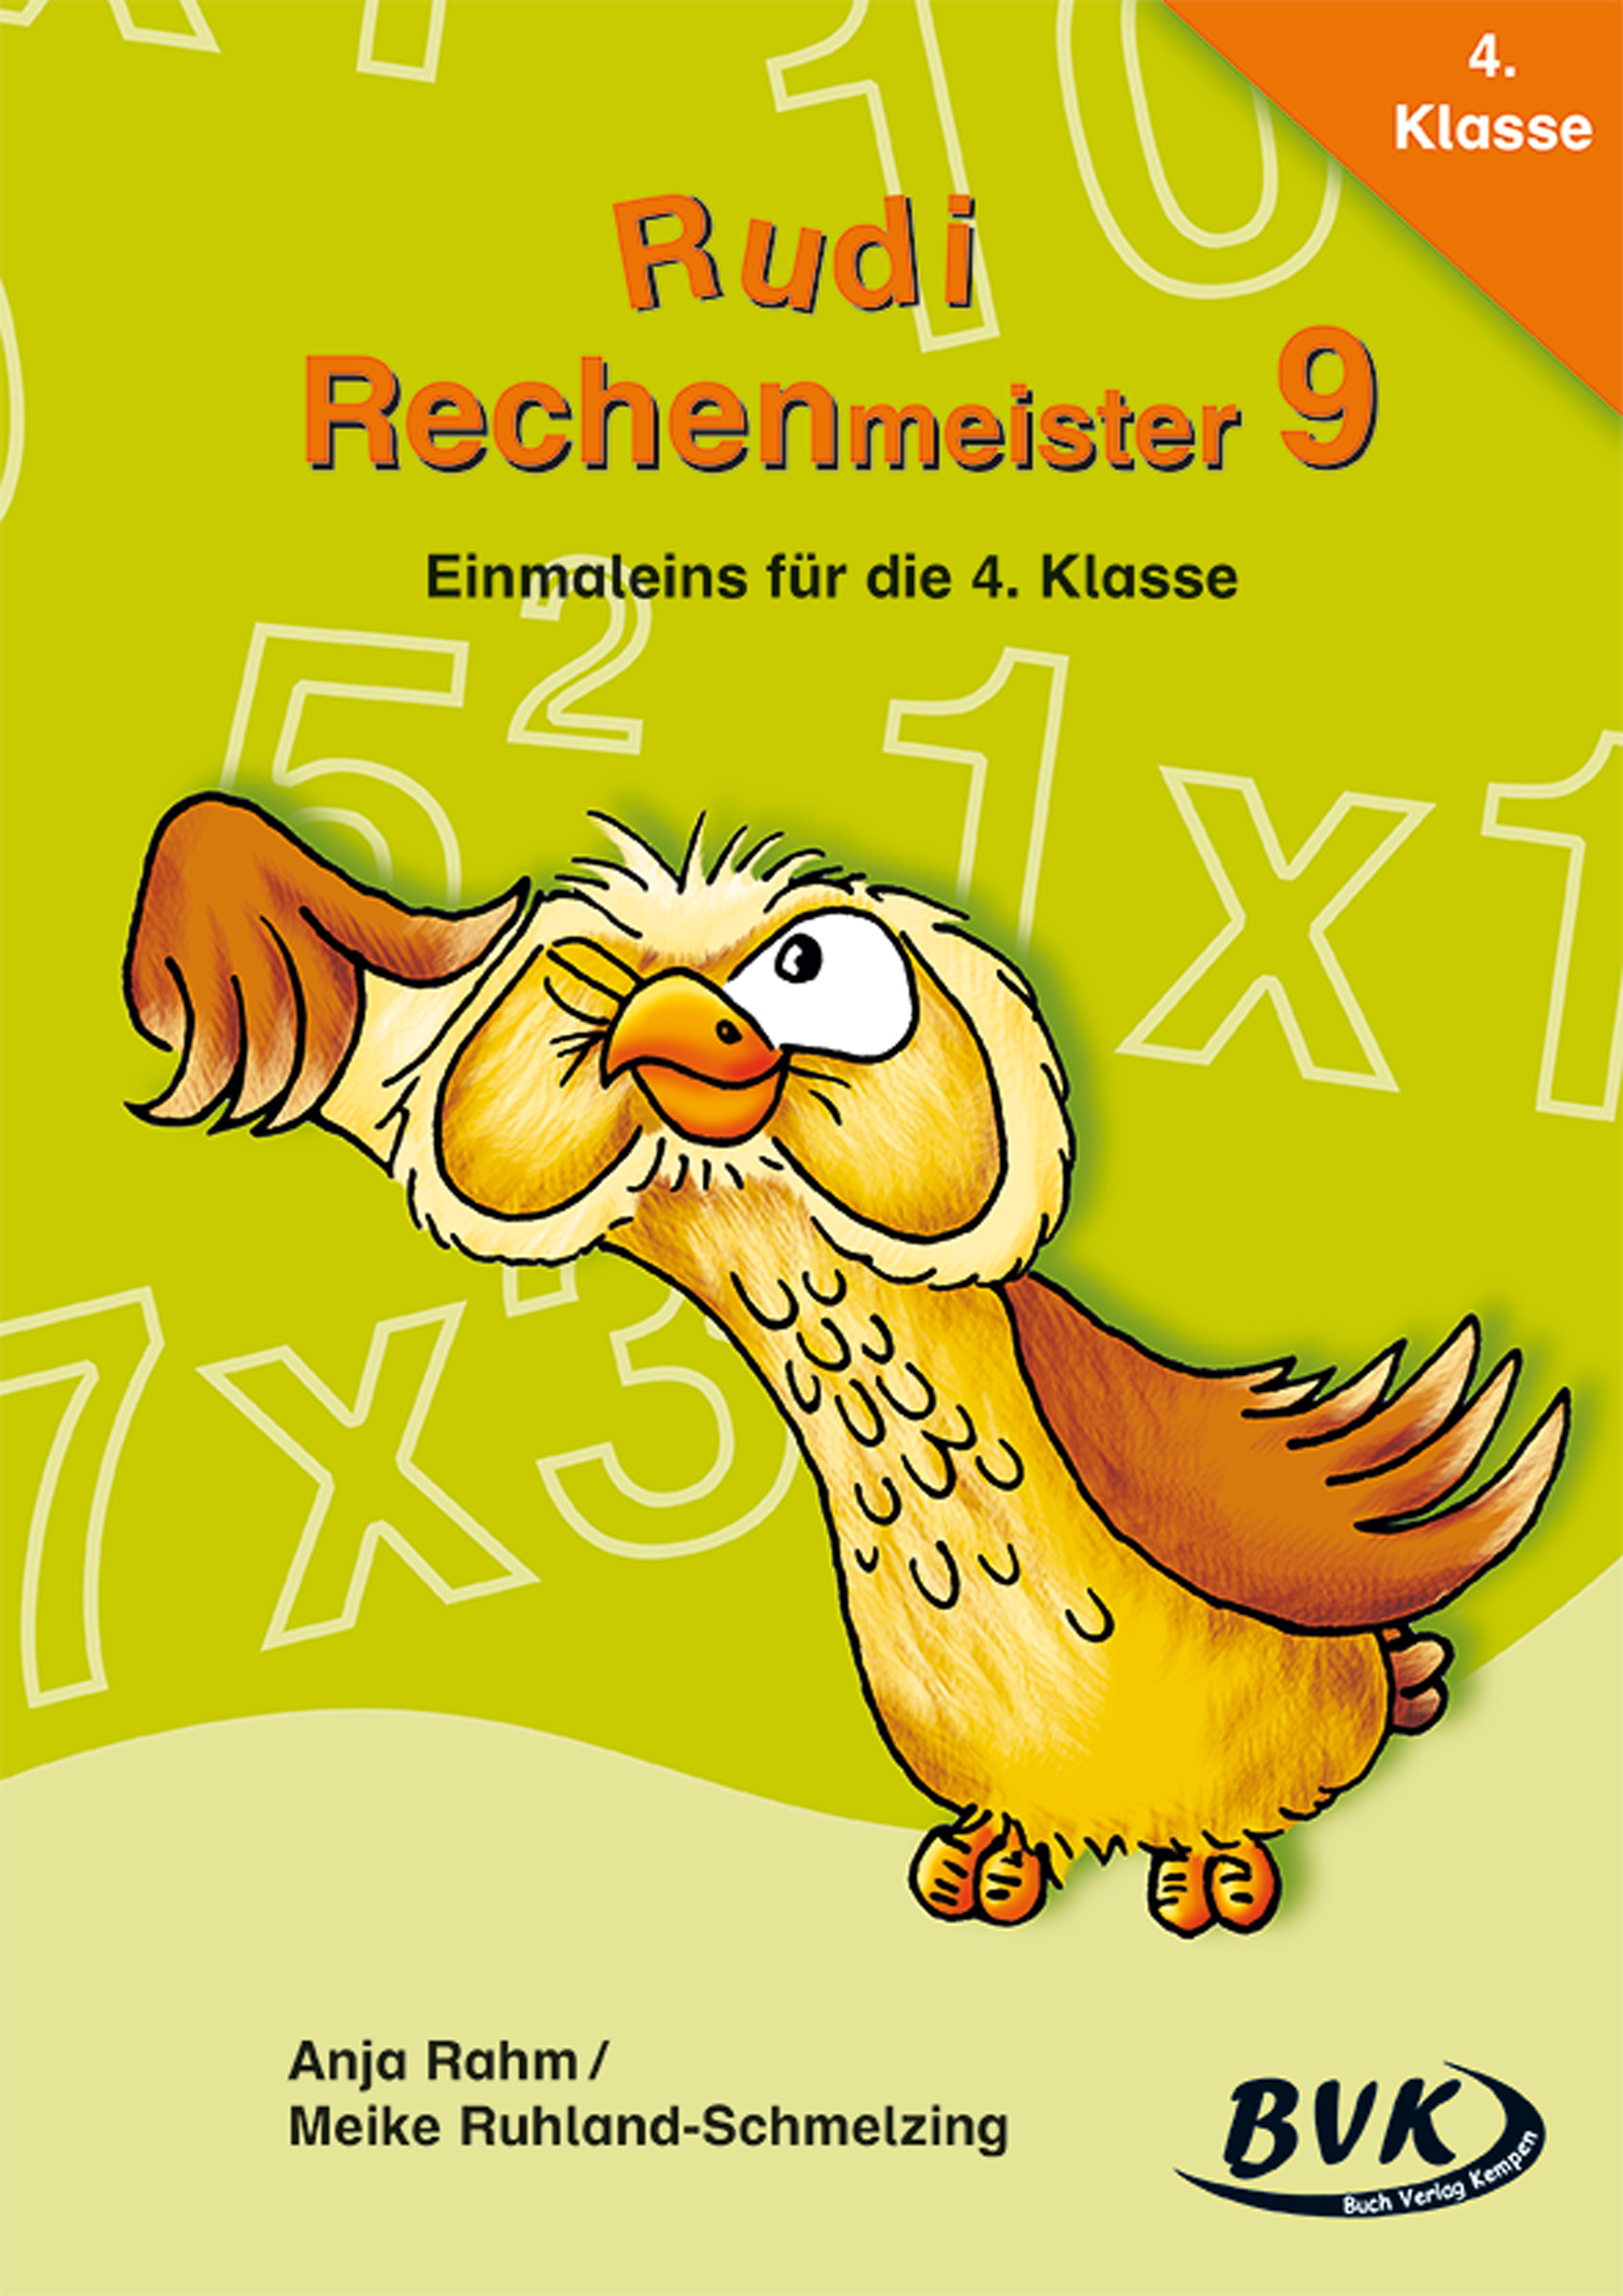 Rudi Rechenmeister 9, Anja Rahm